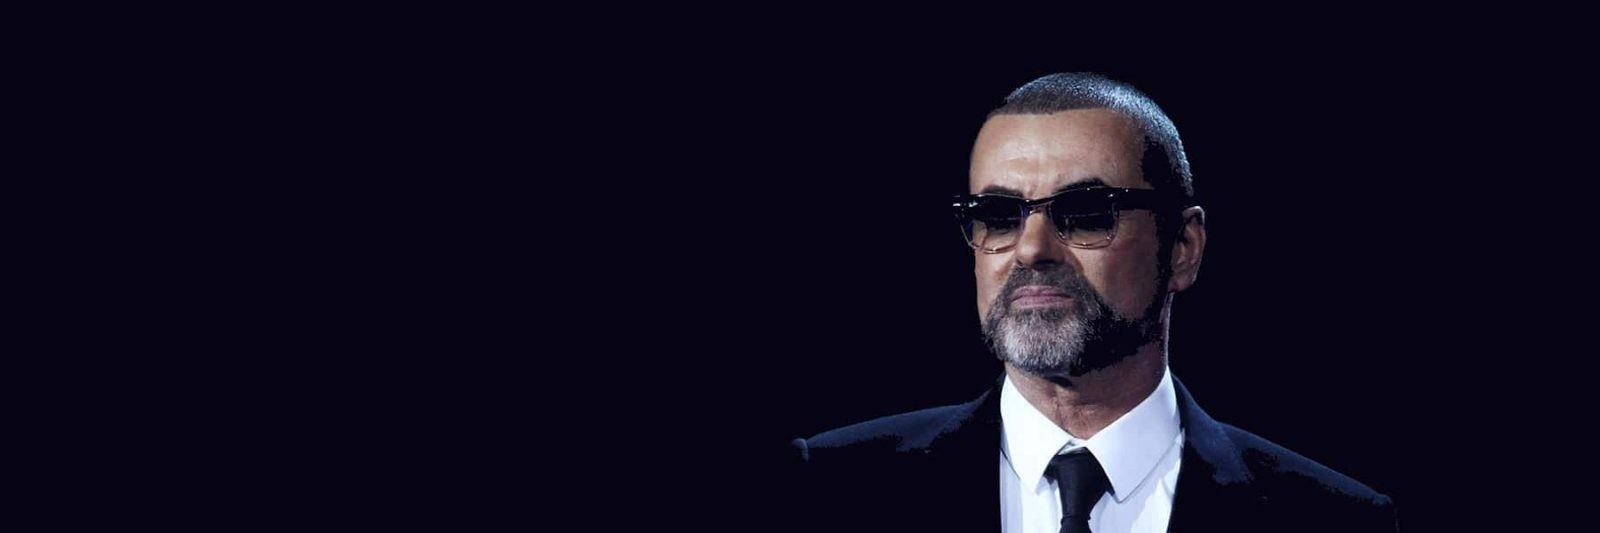 Michael, George